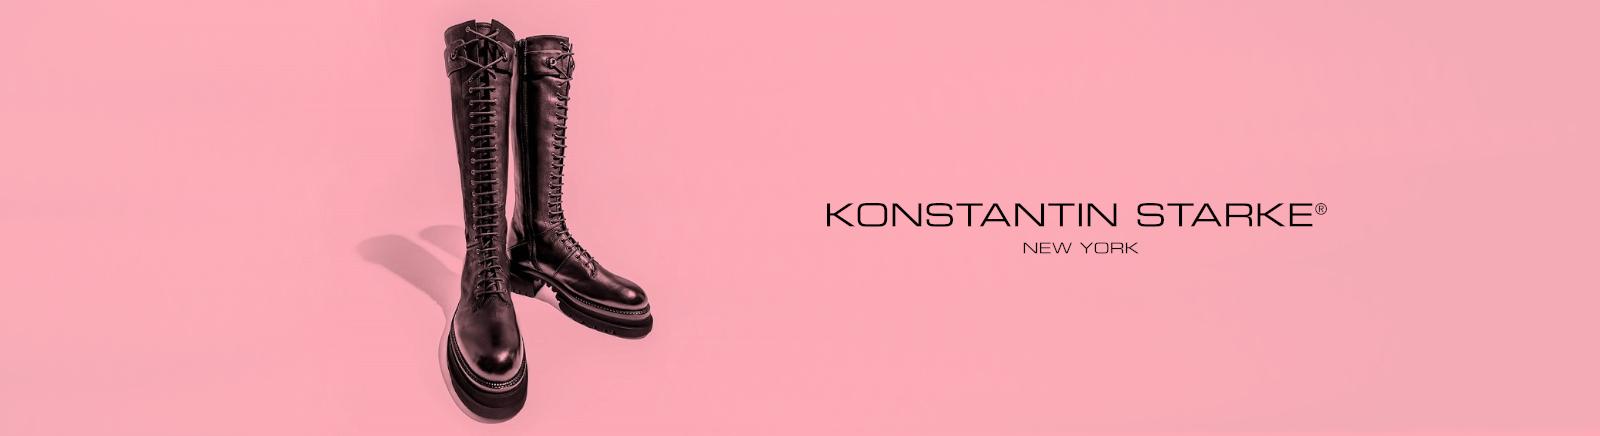 Konstantin Starke Markenschuhe online entdecken im Juppen Shop